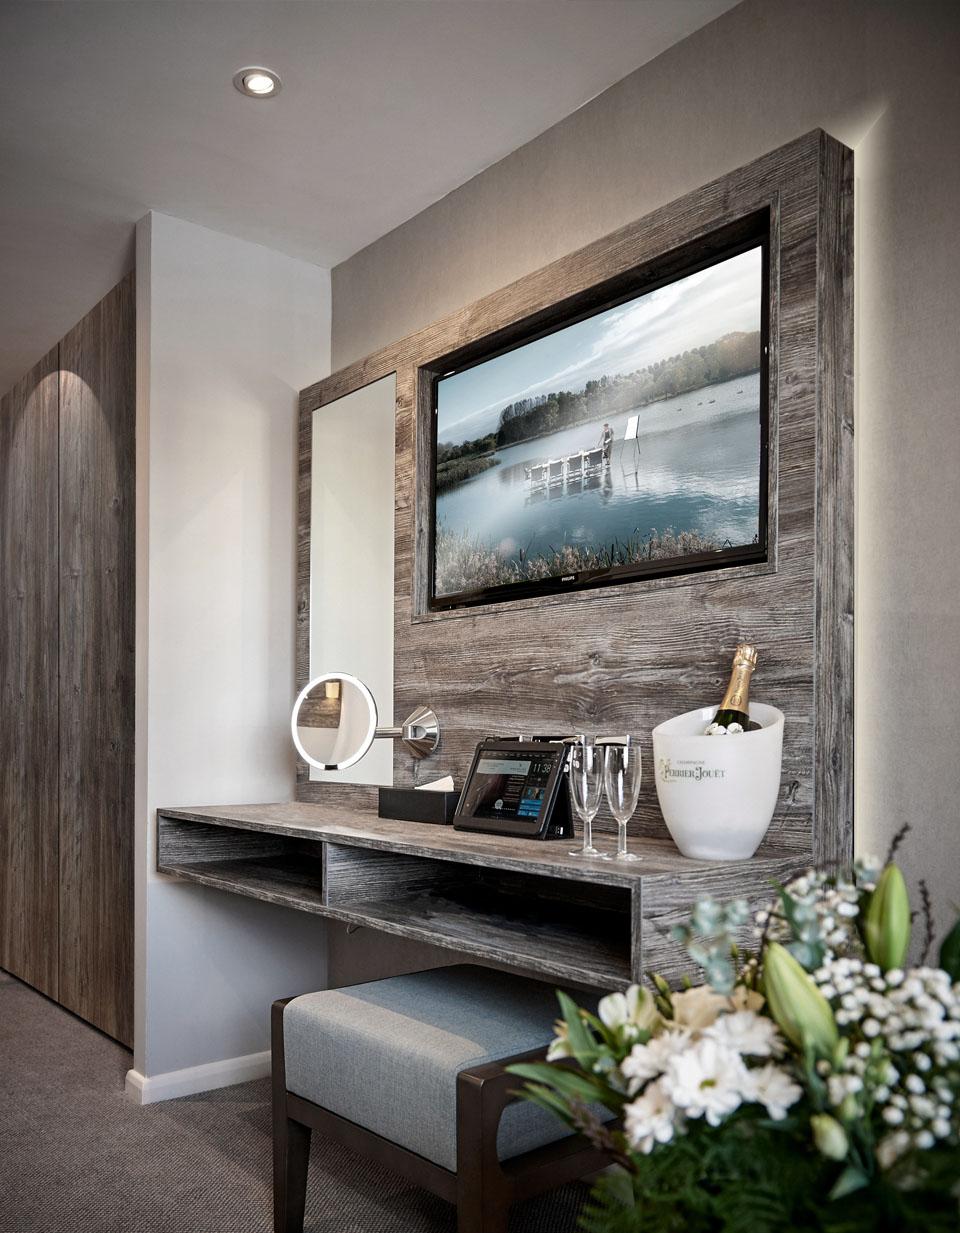 wyboston-hotel-design-bedroom-design